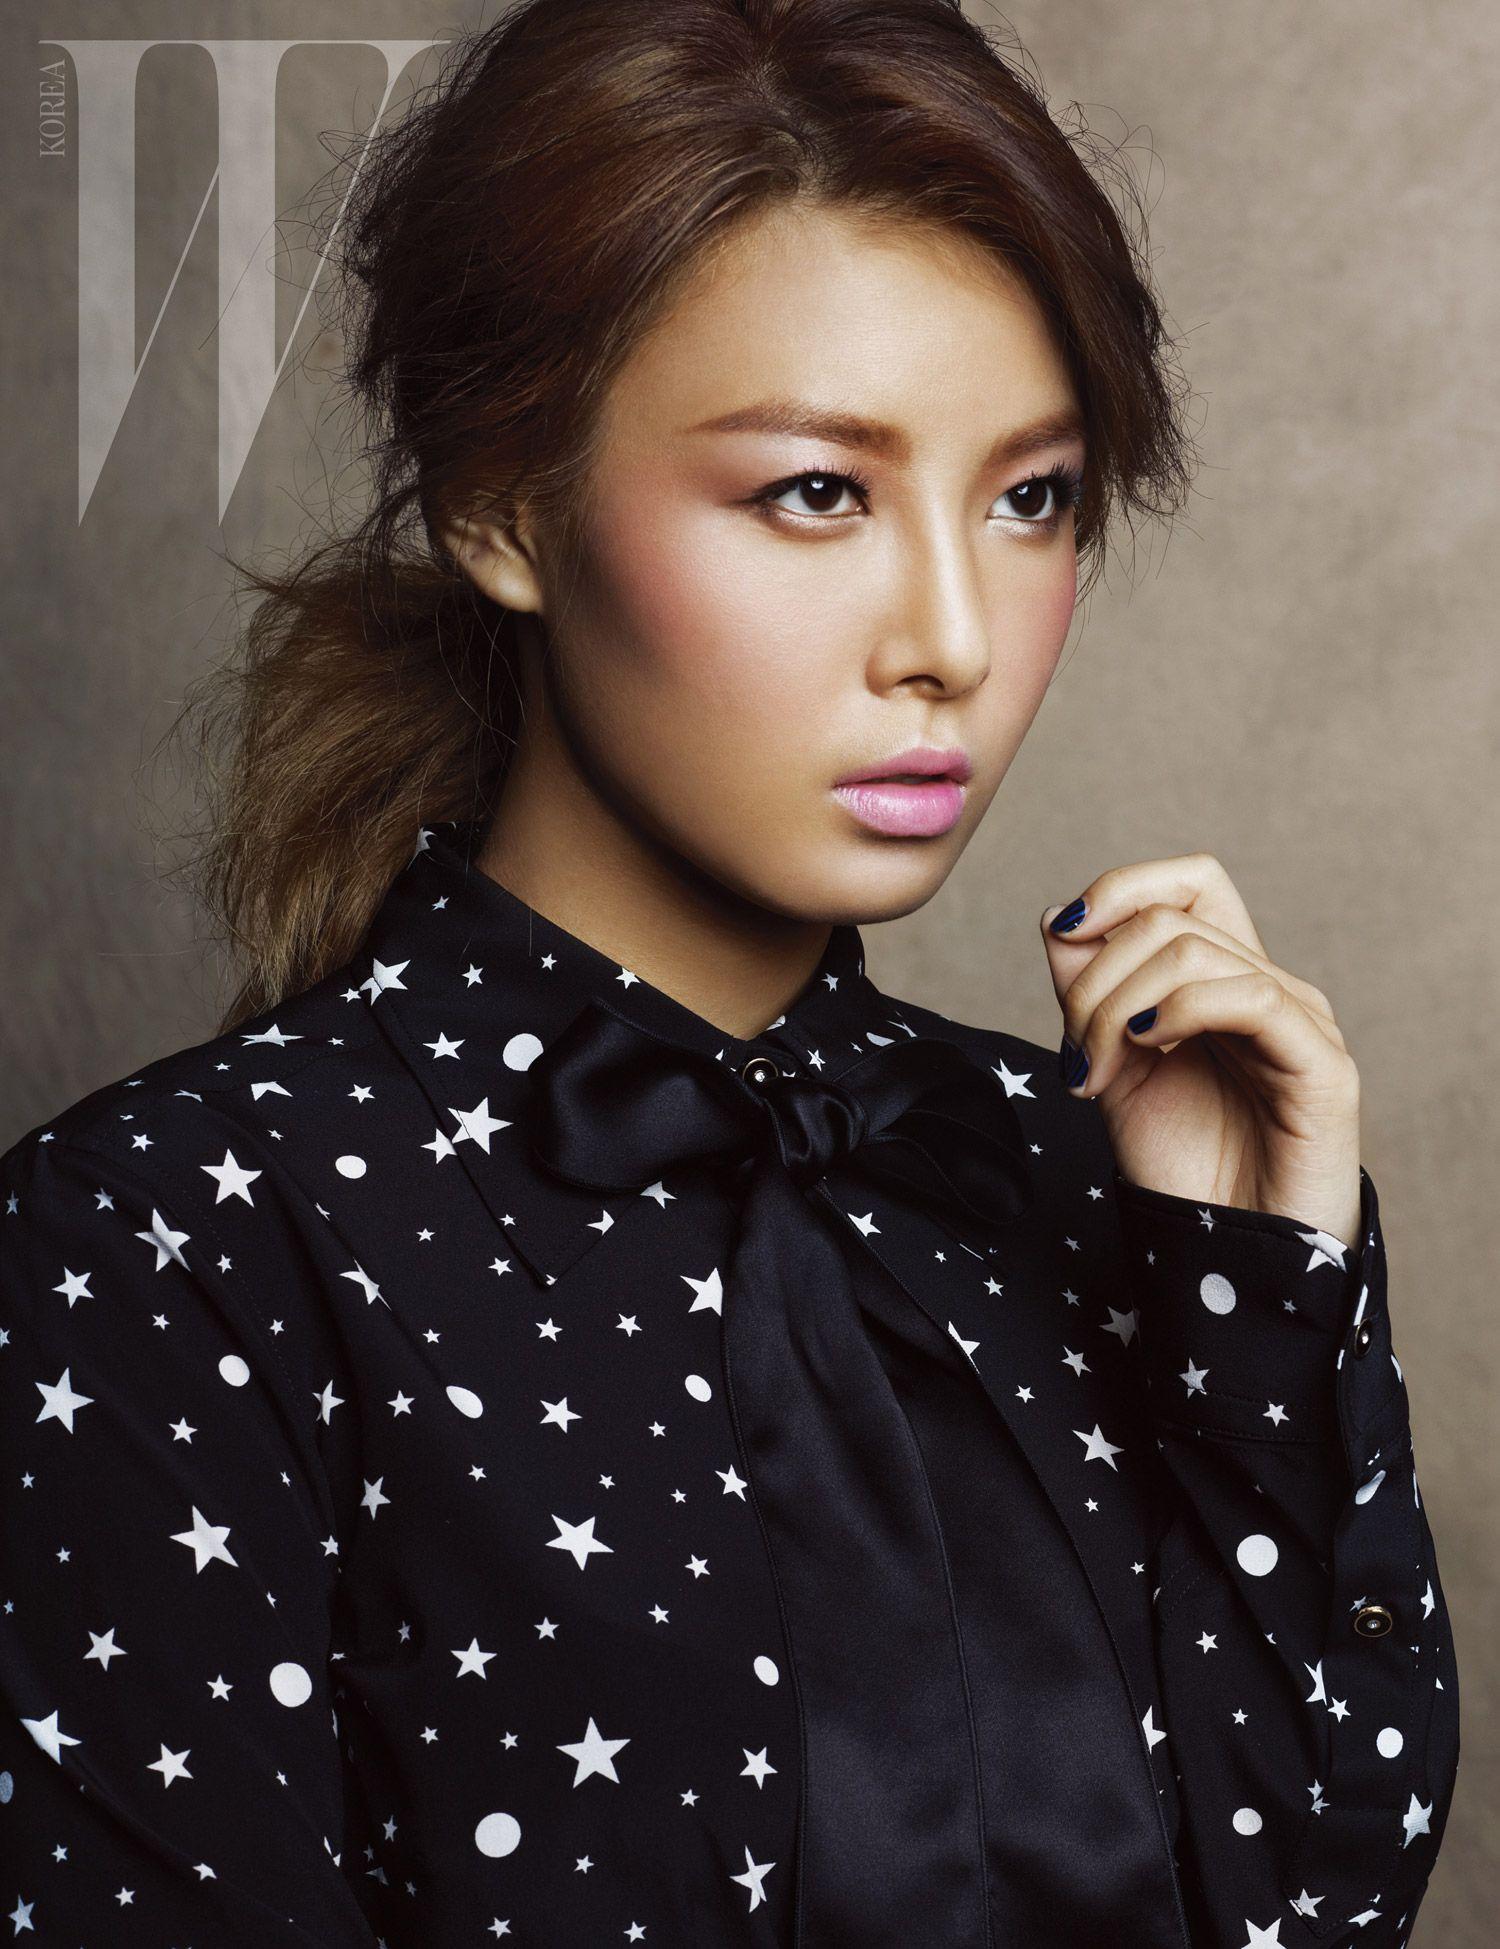 Wonder Girls Yubin for W Magazine Korea (With images